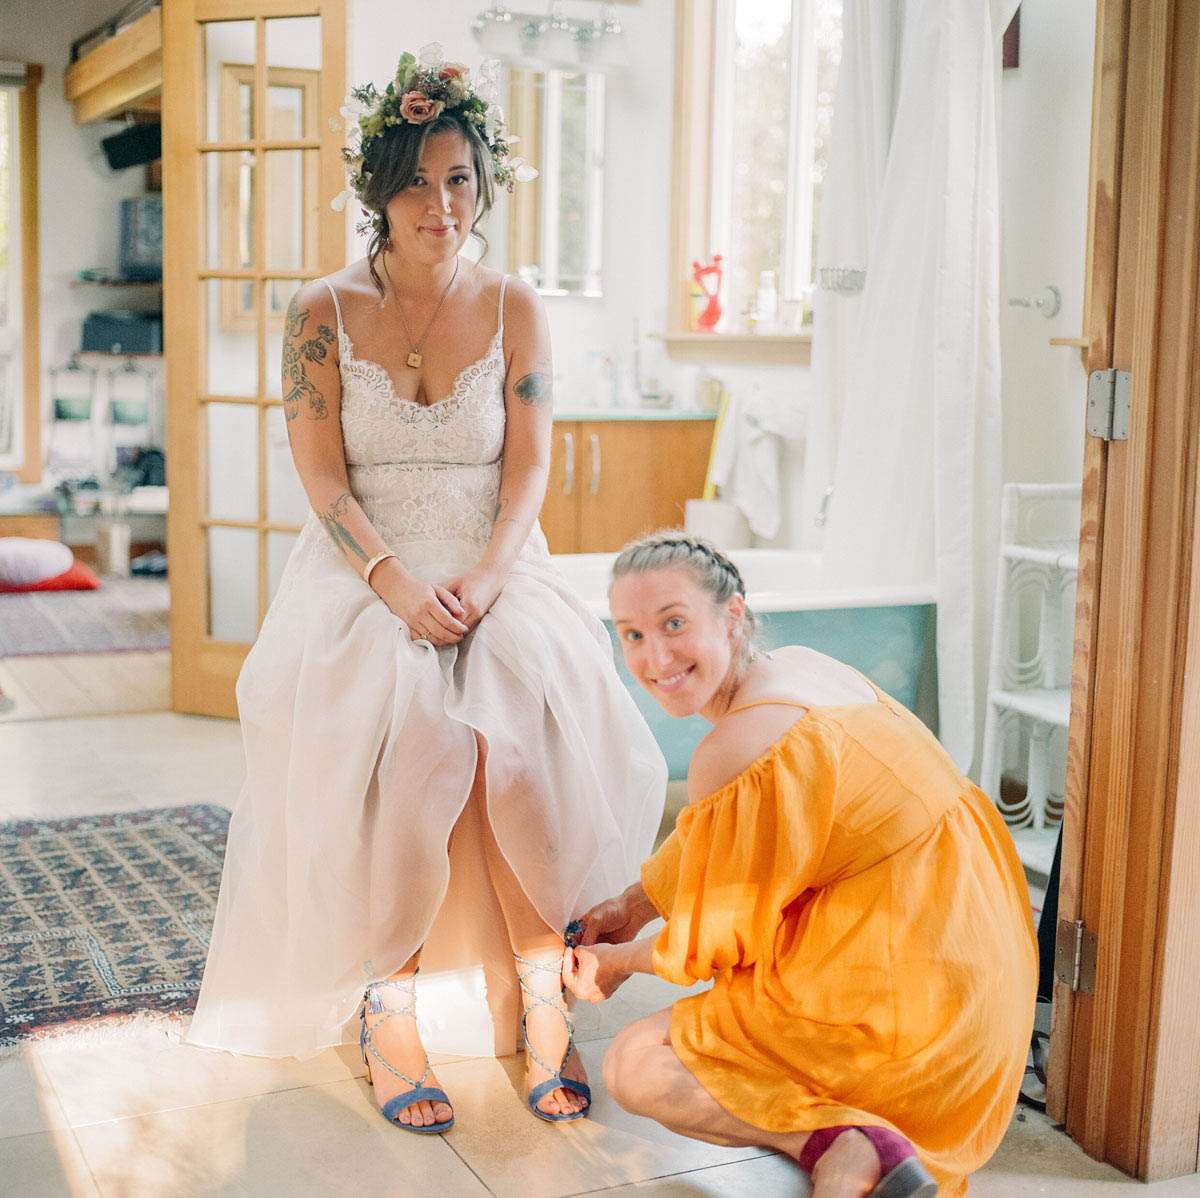 2-hasselblad-wedding.jpg